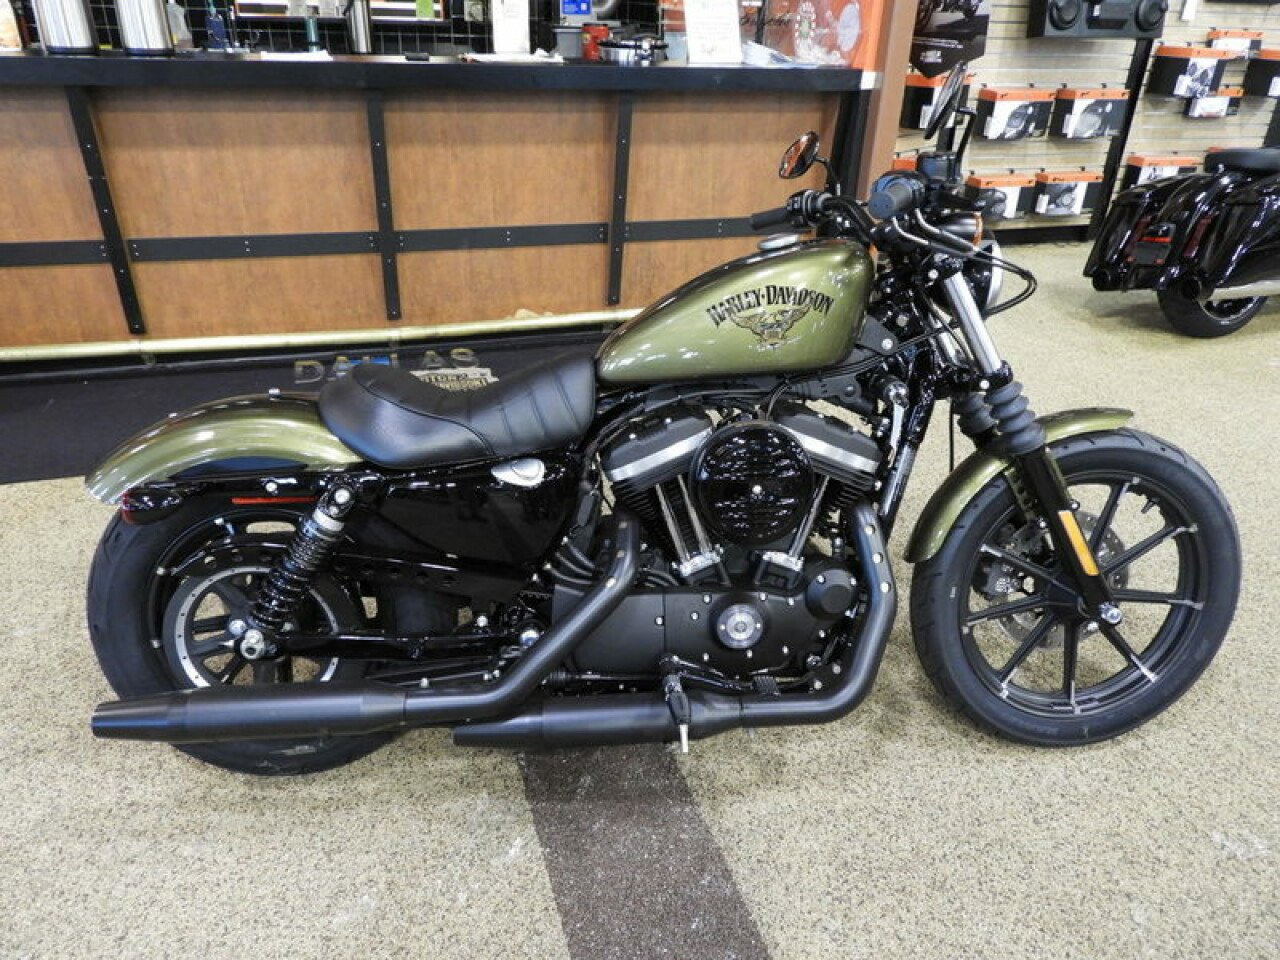 2017 Harley-Davidson Sportster Iron 883 for sale near ...